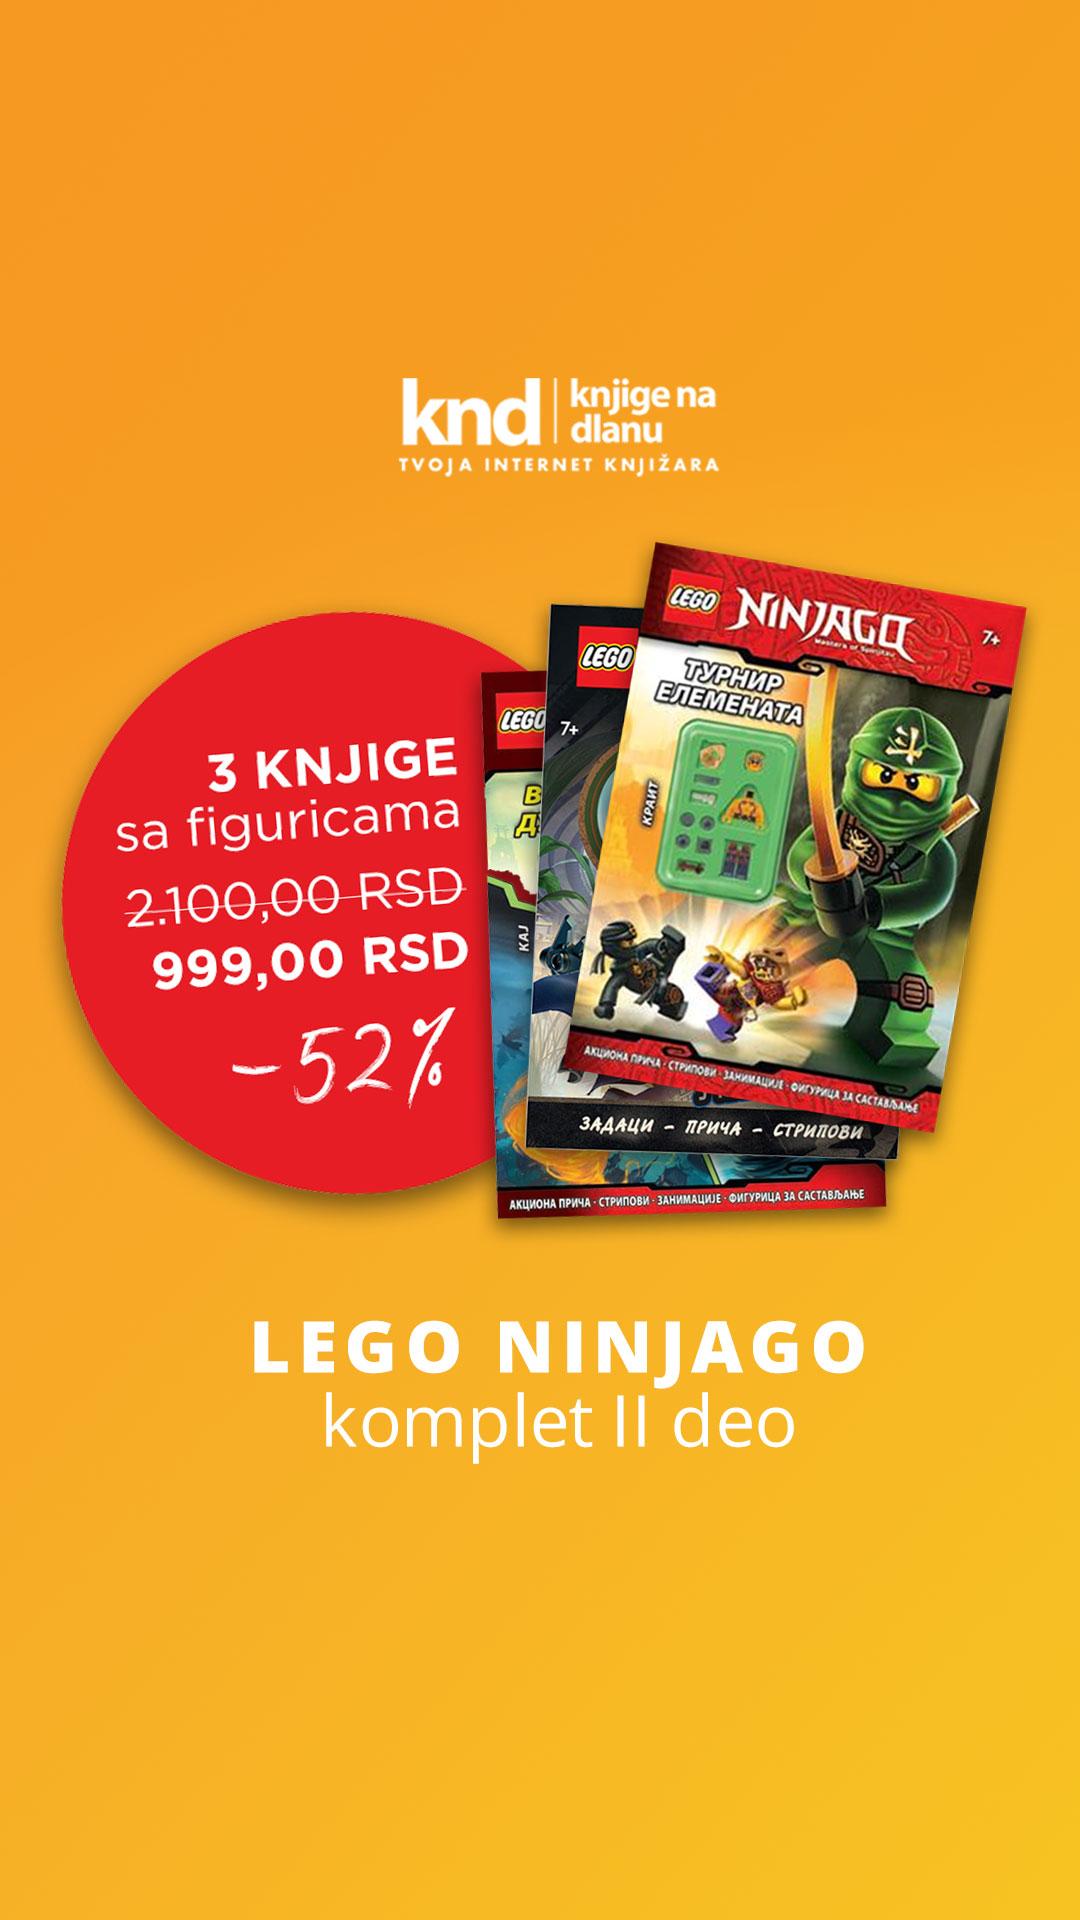 LEGO NINJAGO KOMPLET II deo – 3 KNJIGE SA FIGURICAMA ZA 999